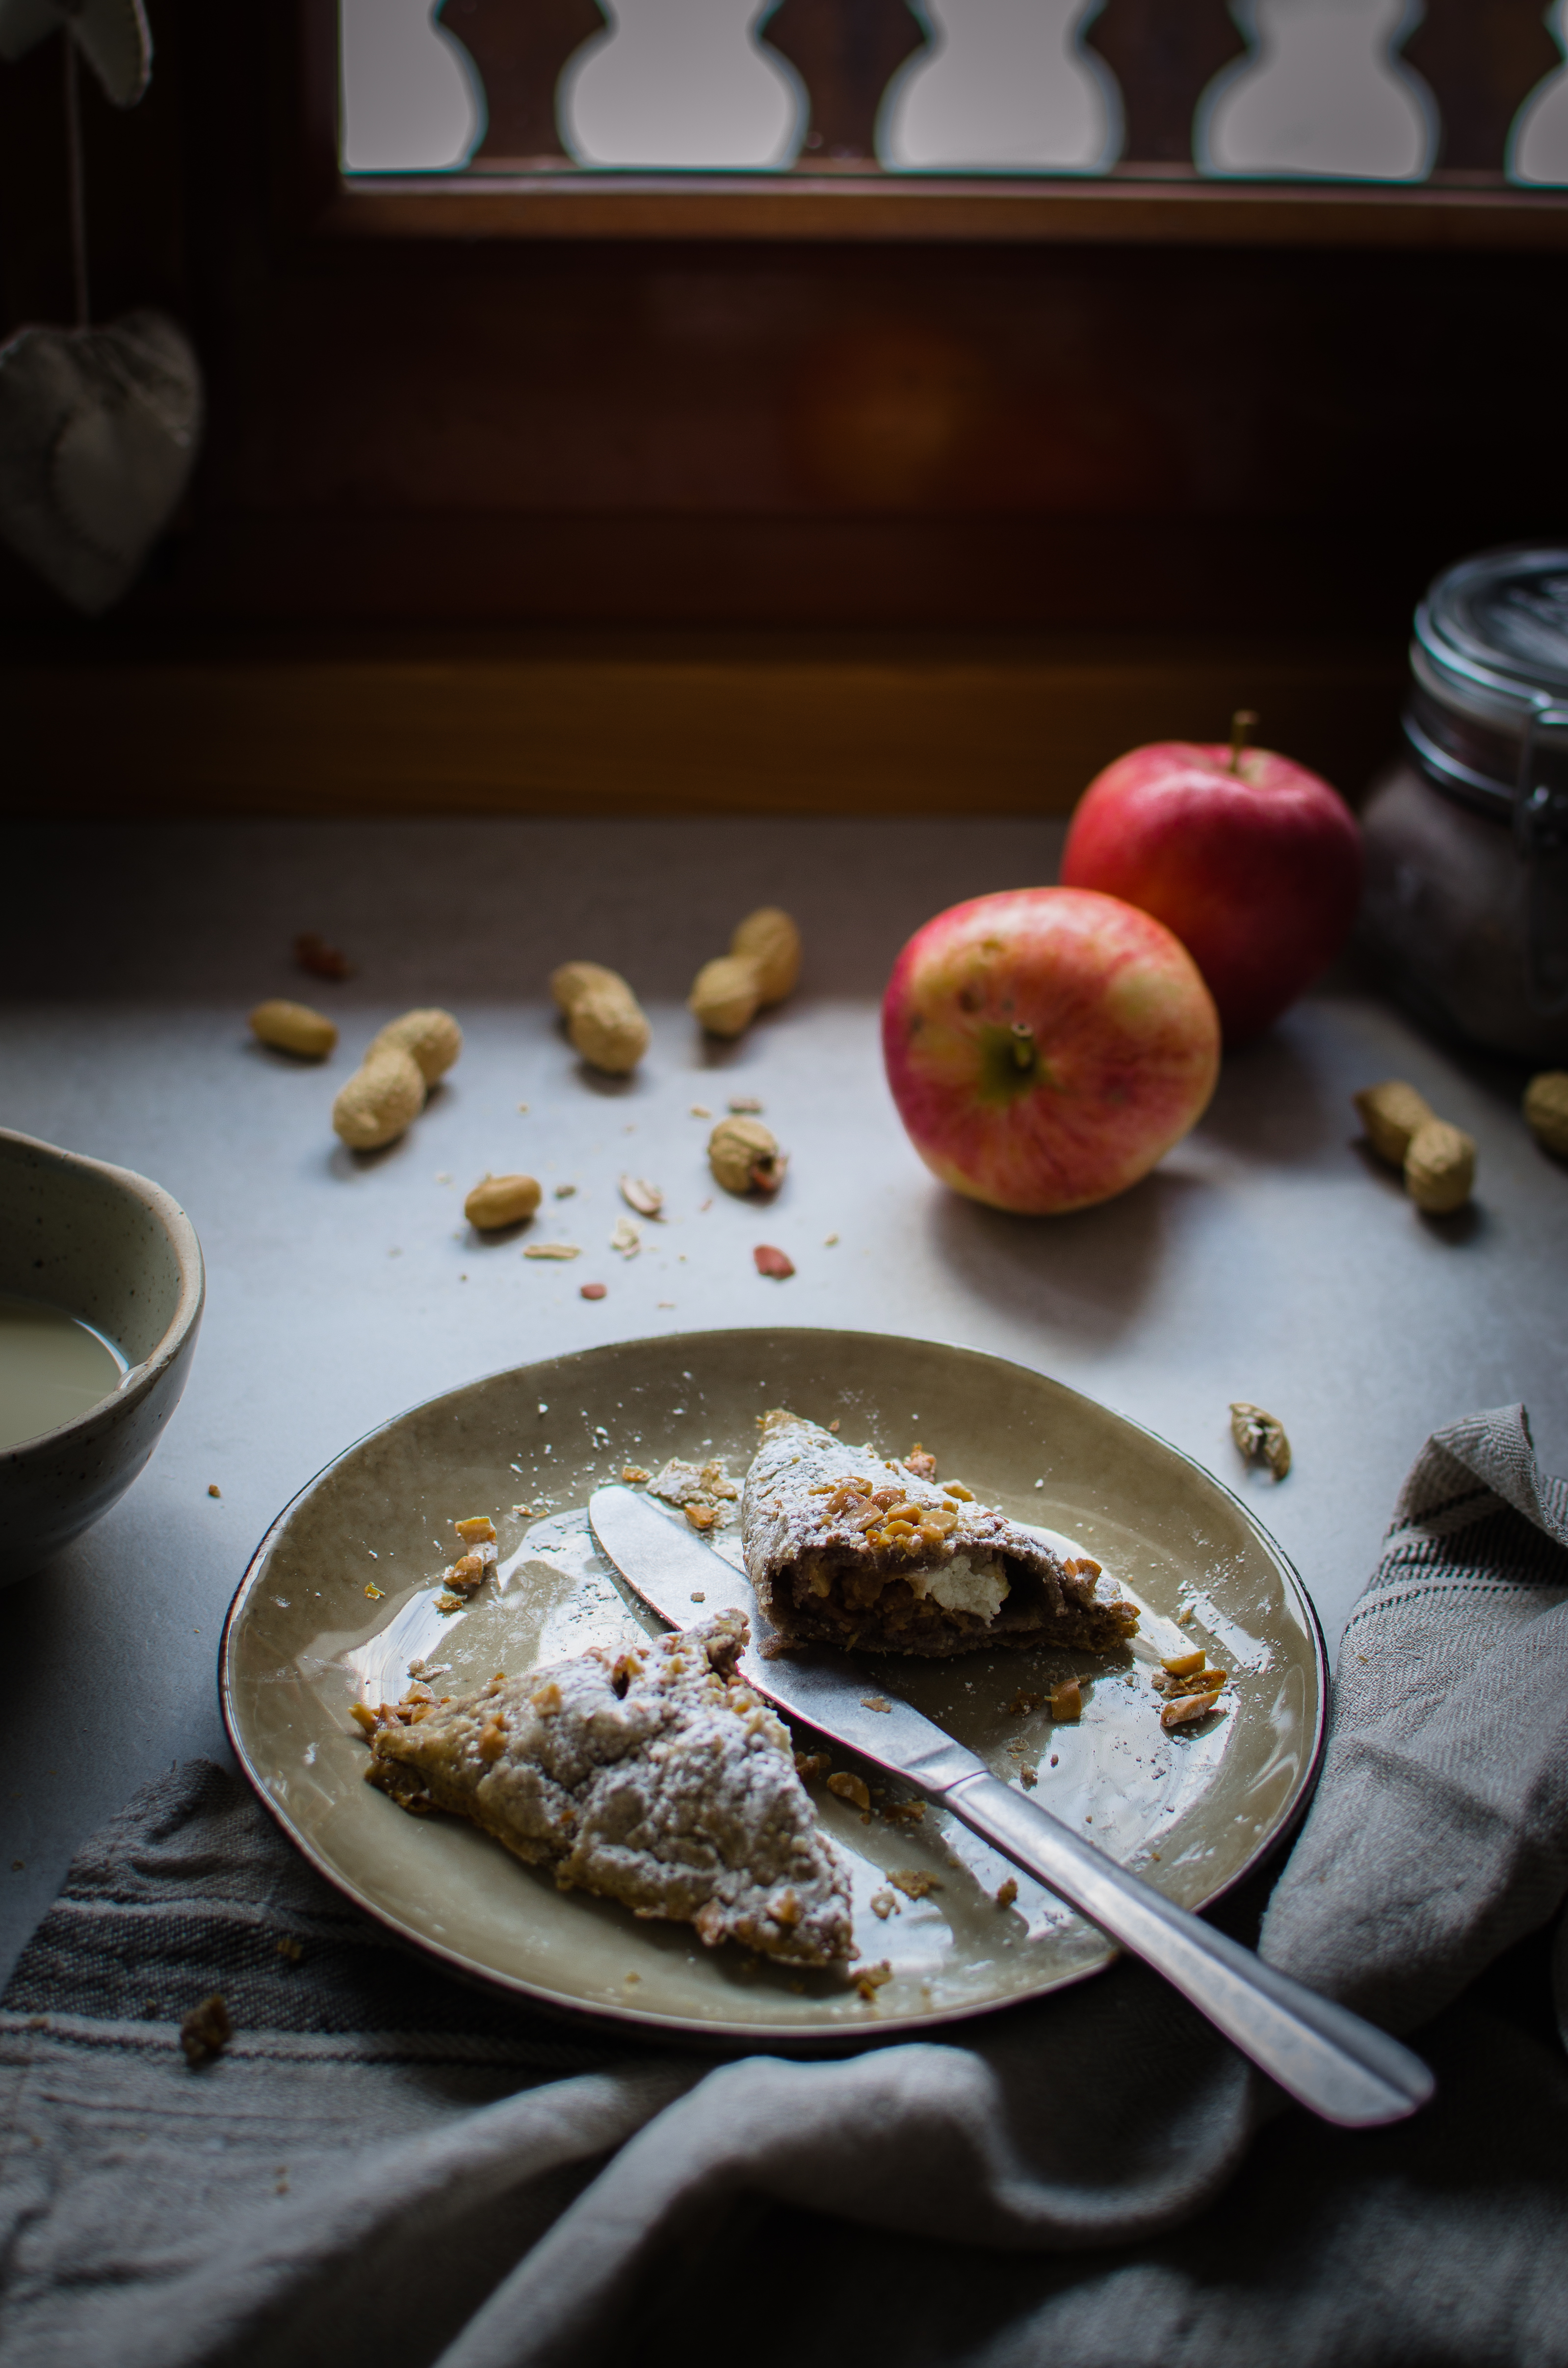 turnovers-arachidi Turnovers mele, arachidi, cannella e ricotta di capra